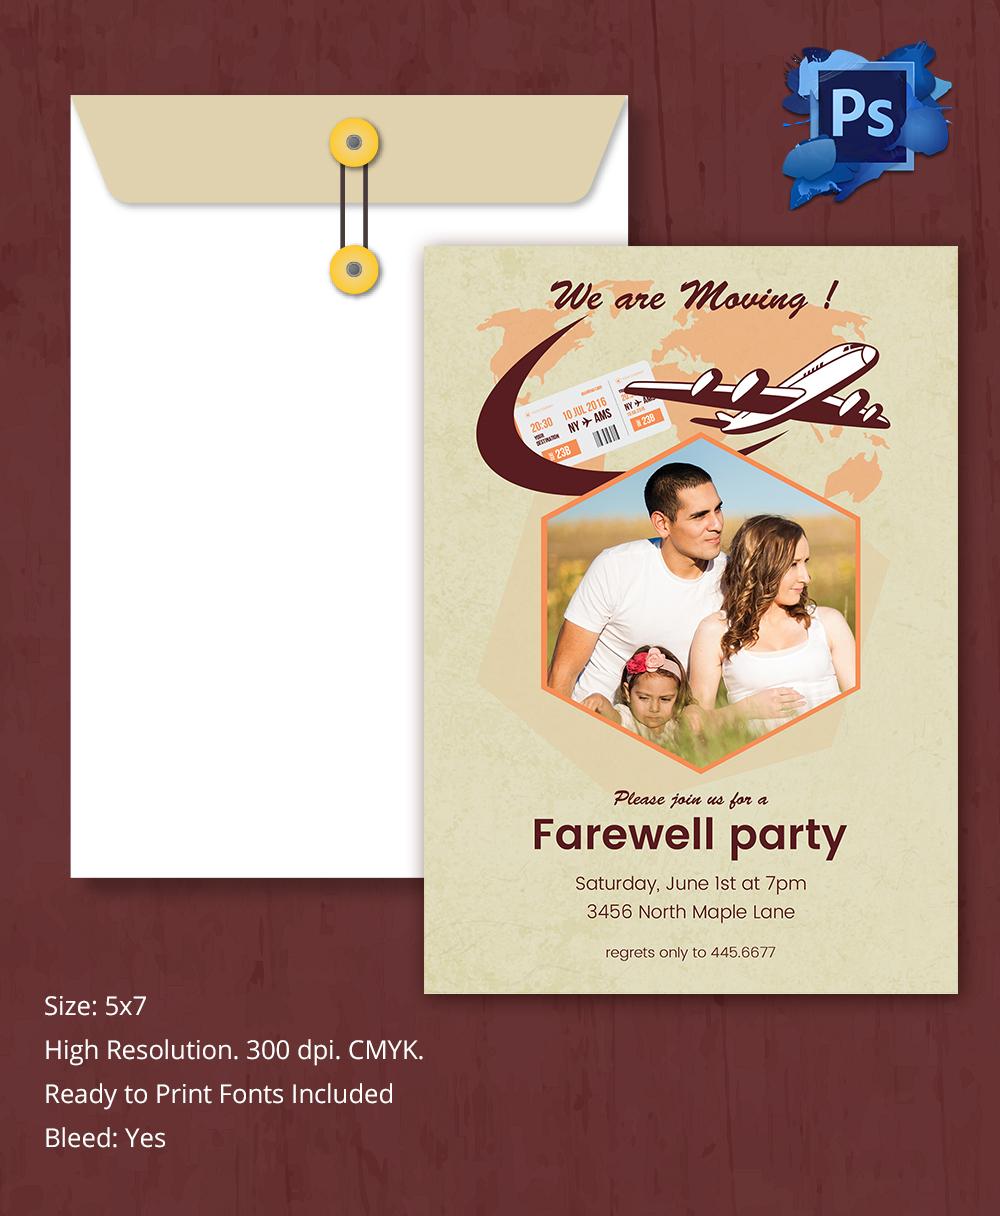 Farewell-Invitation-Party-Template